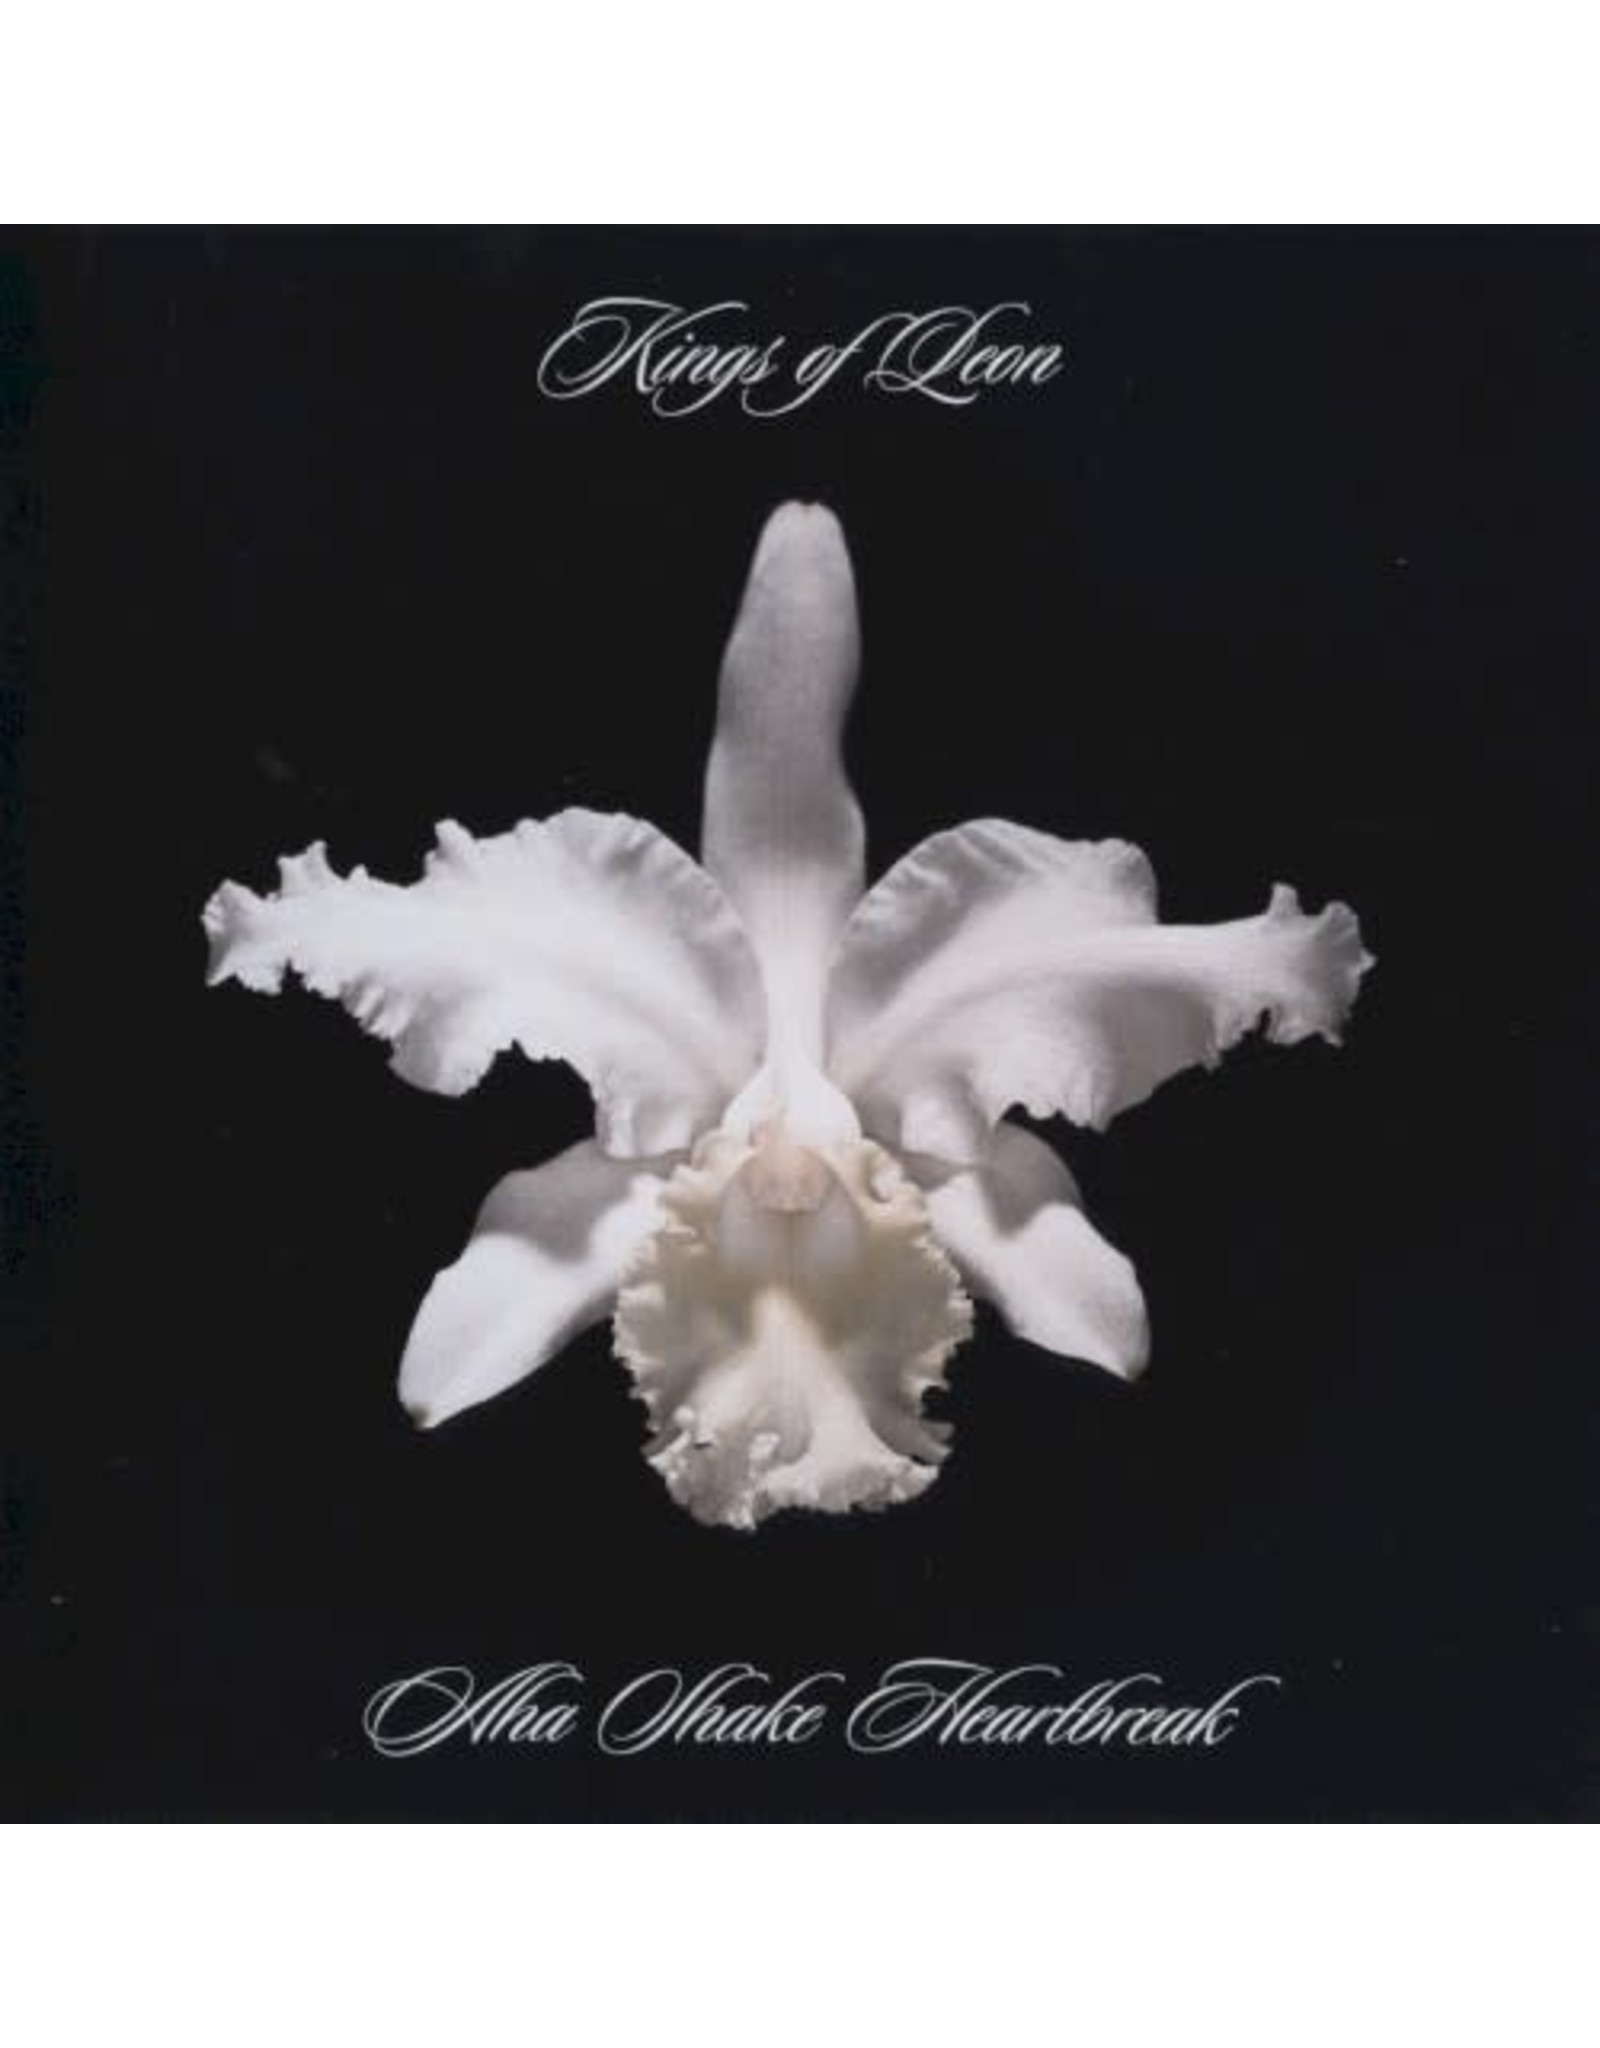 Kings Of Leon - Aha Shake Heartbreak 2LP (Ltd Ed. Transparent Vinyl)